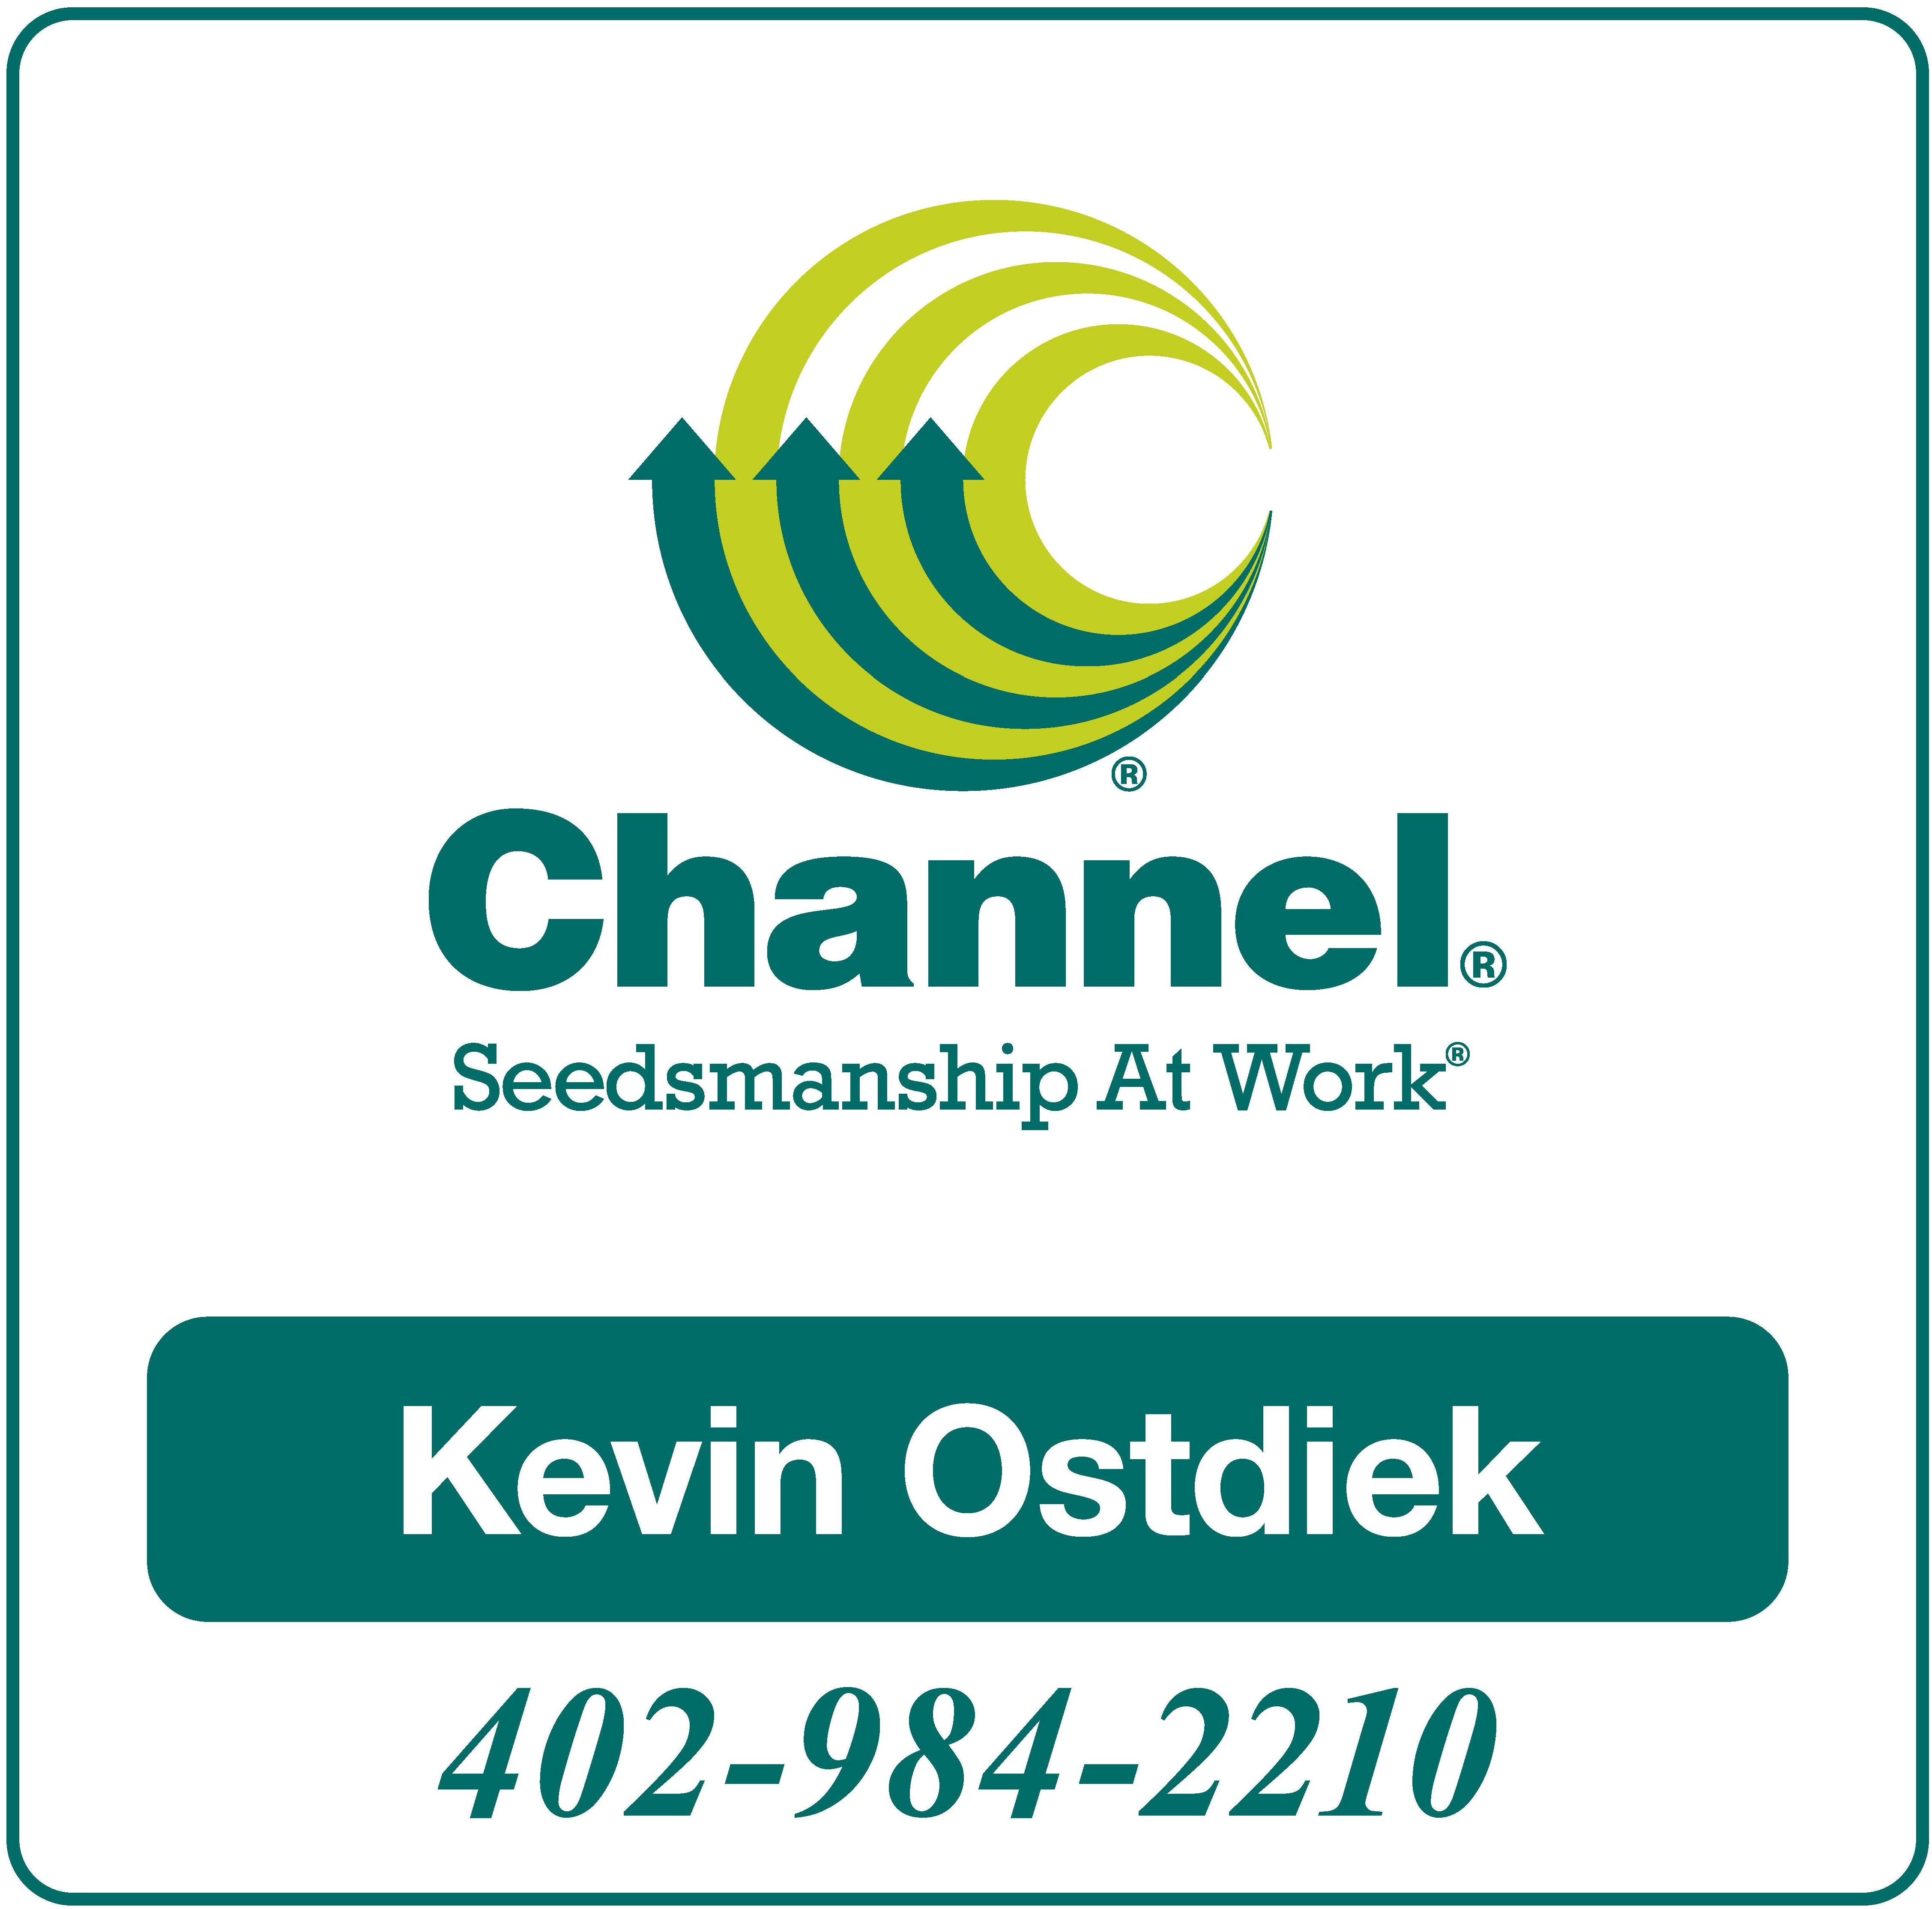 45407_Channel_Custom_Sign_02.jpg